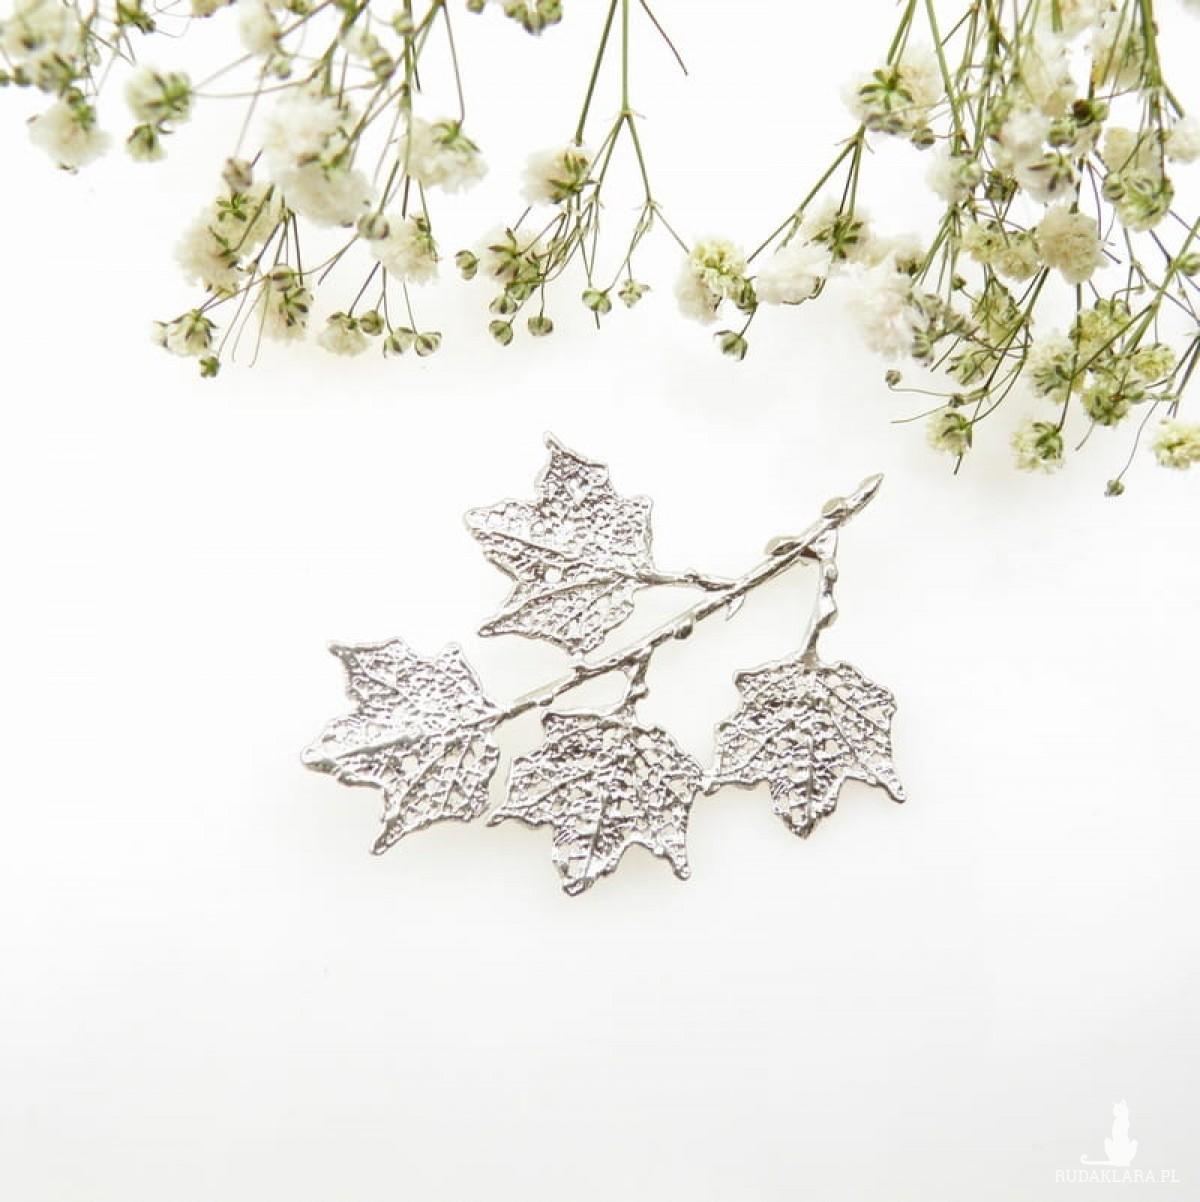 Broszka srebrna - Klonowa gałązka biała